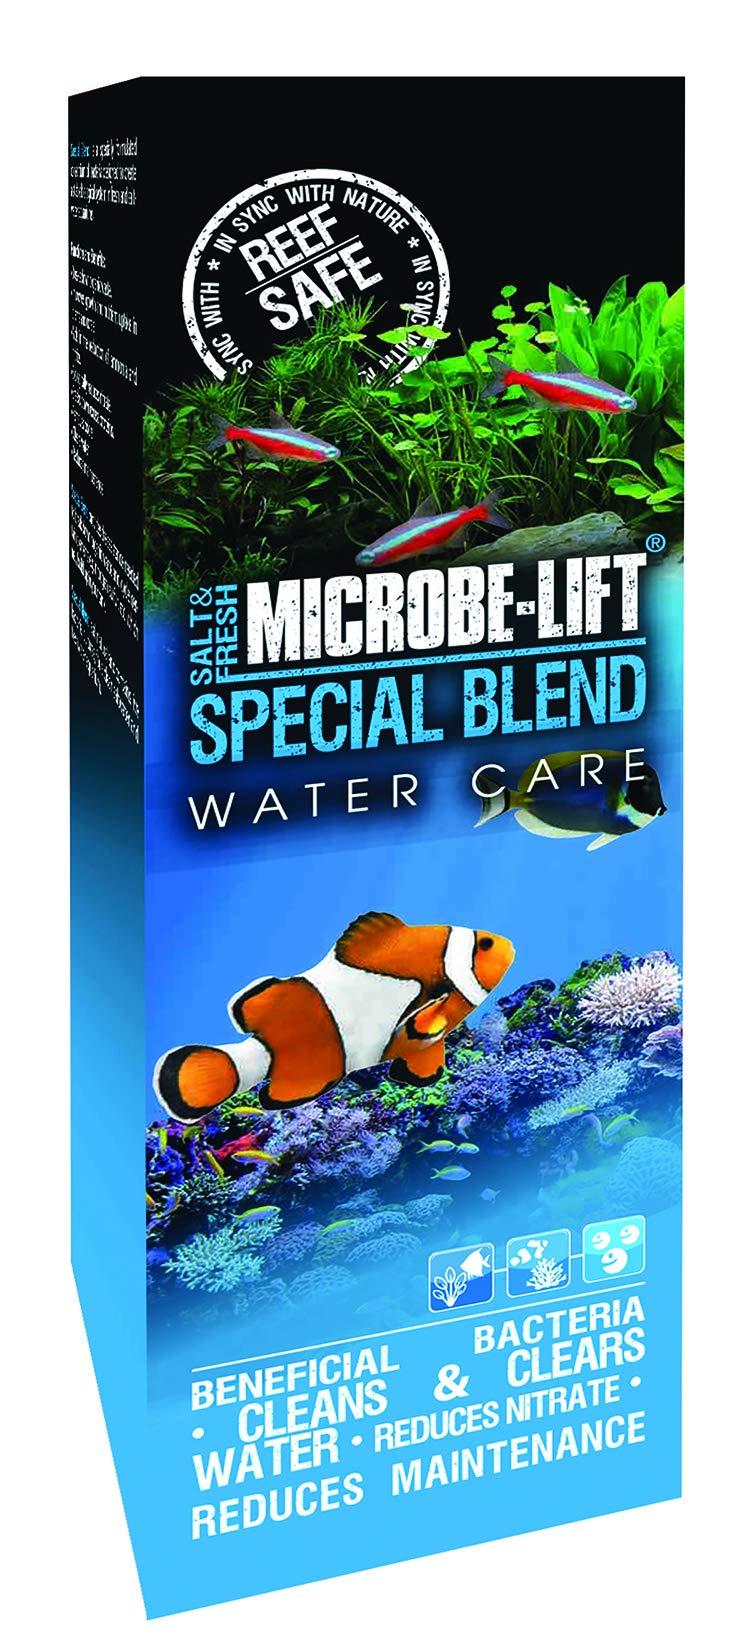 Ecological Laboratories Microbe-Lift Special Blend Aquarium Bacteria Size: 8.5 oz.